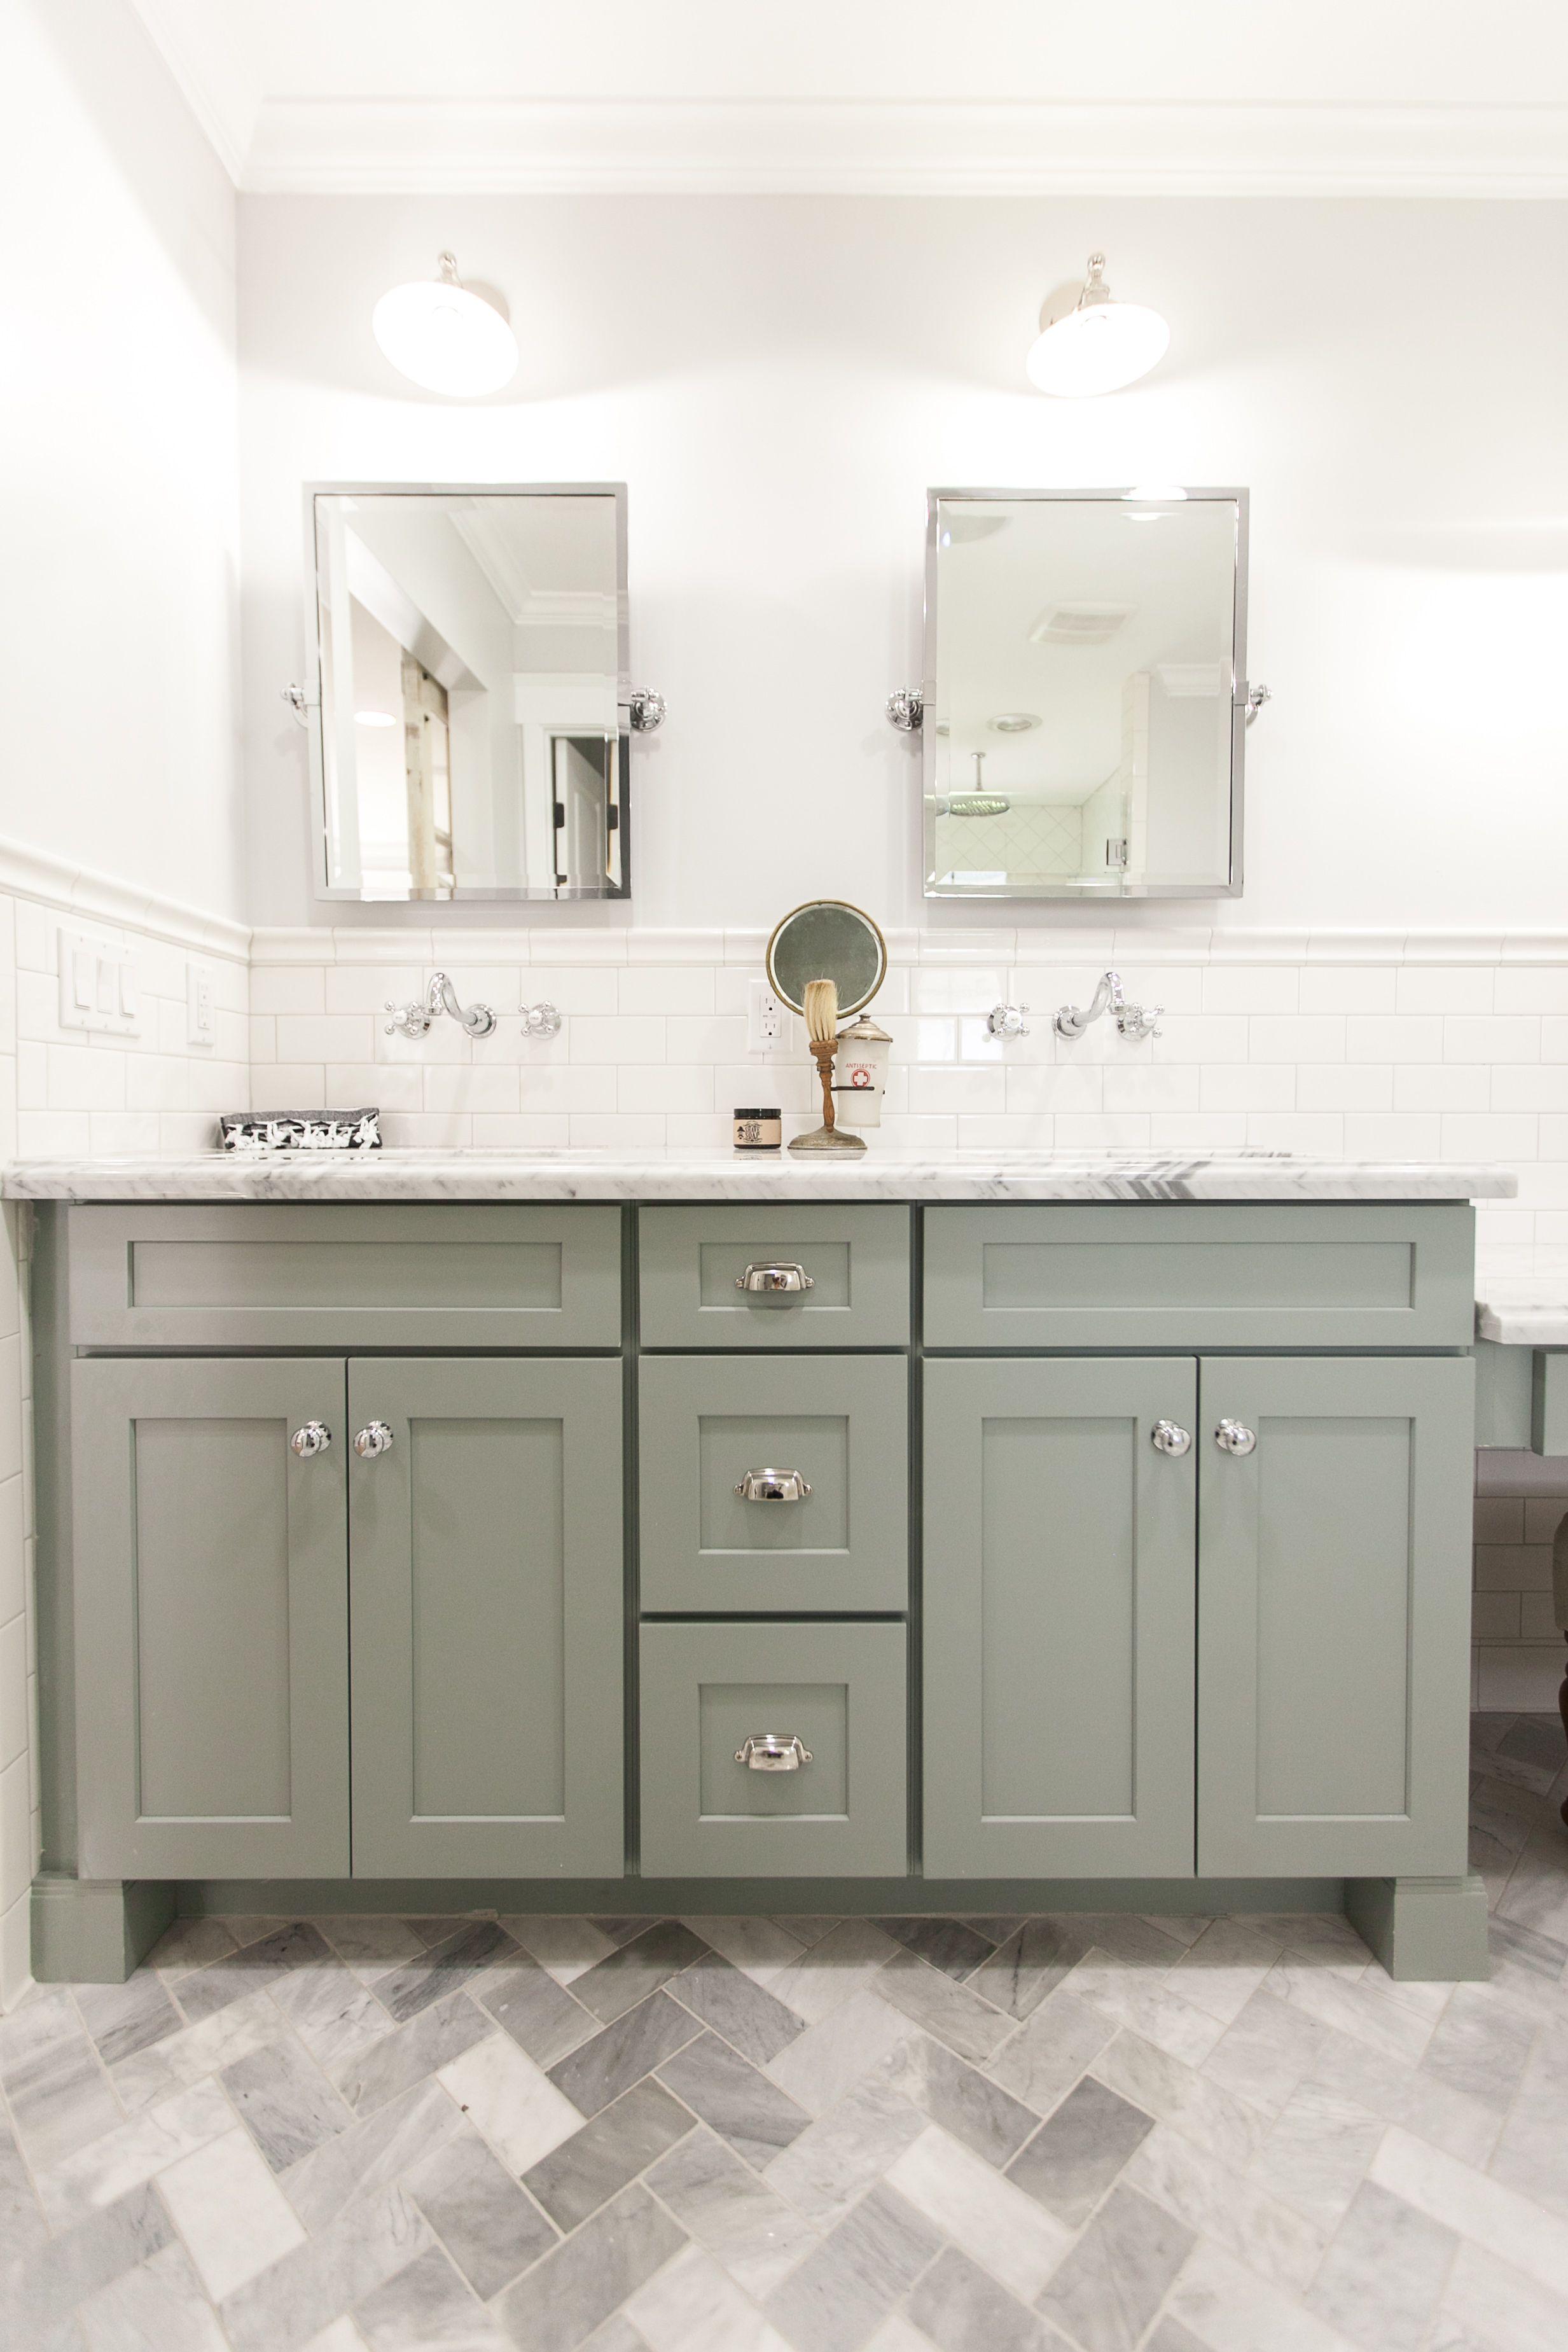 Grey shaker style bath vanity with carrara marble counter